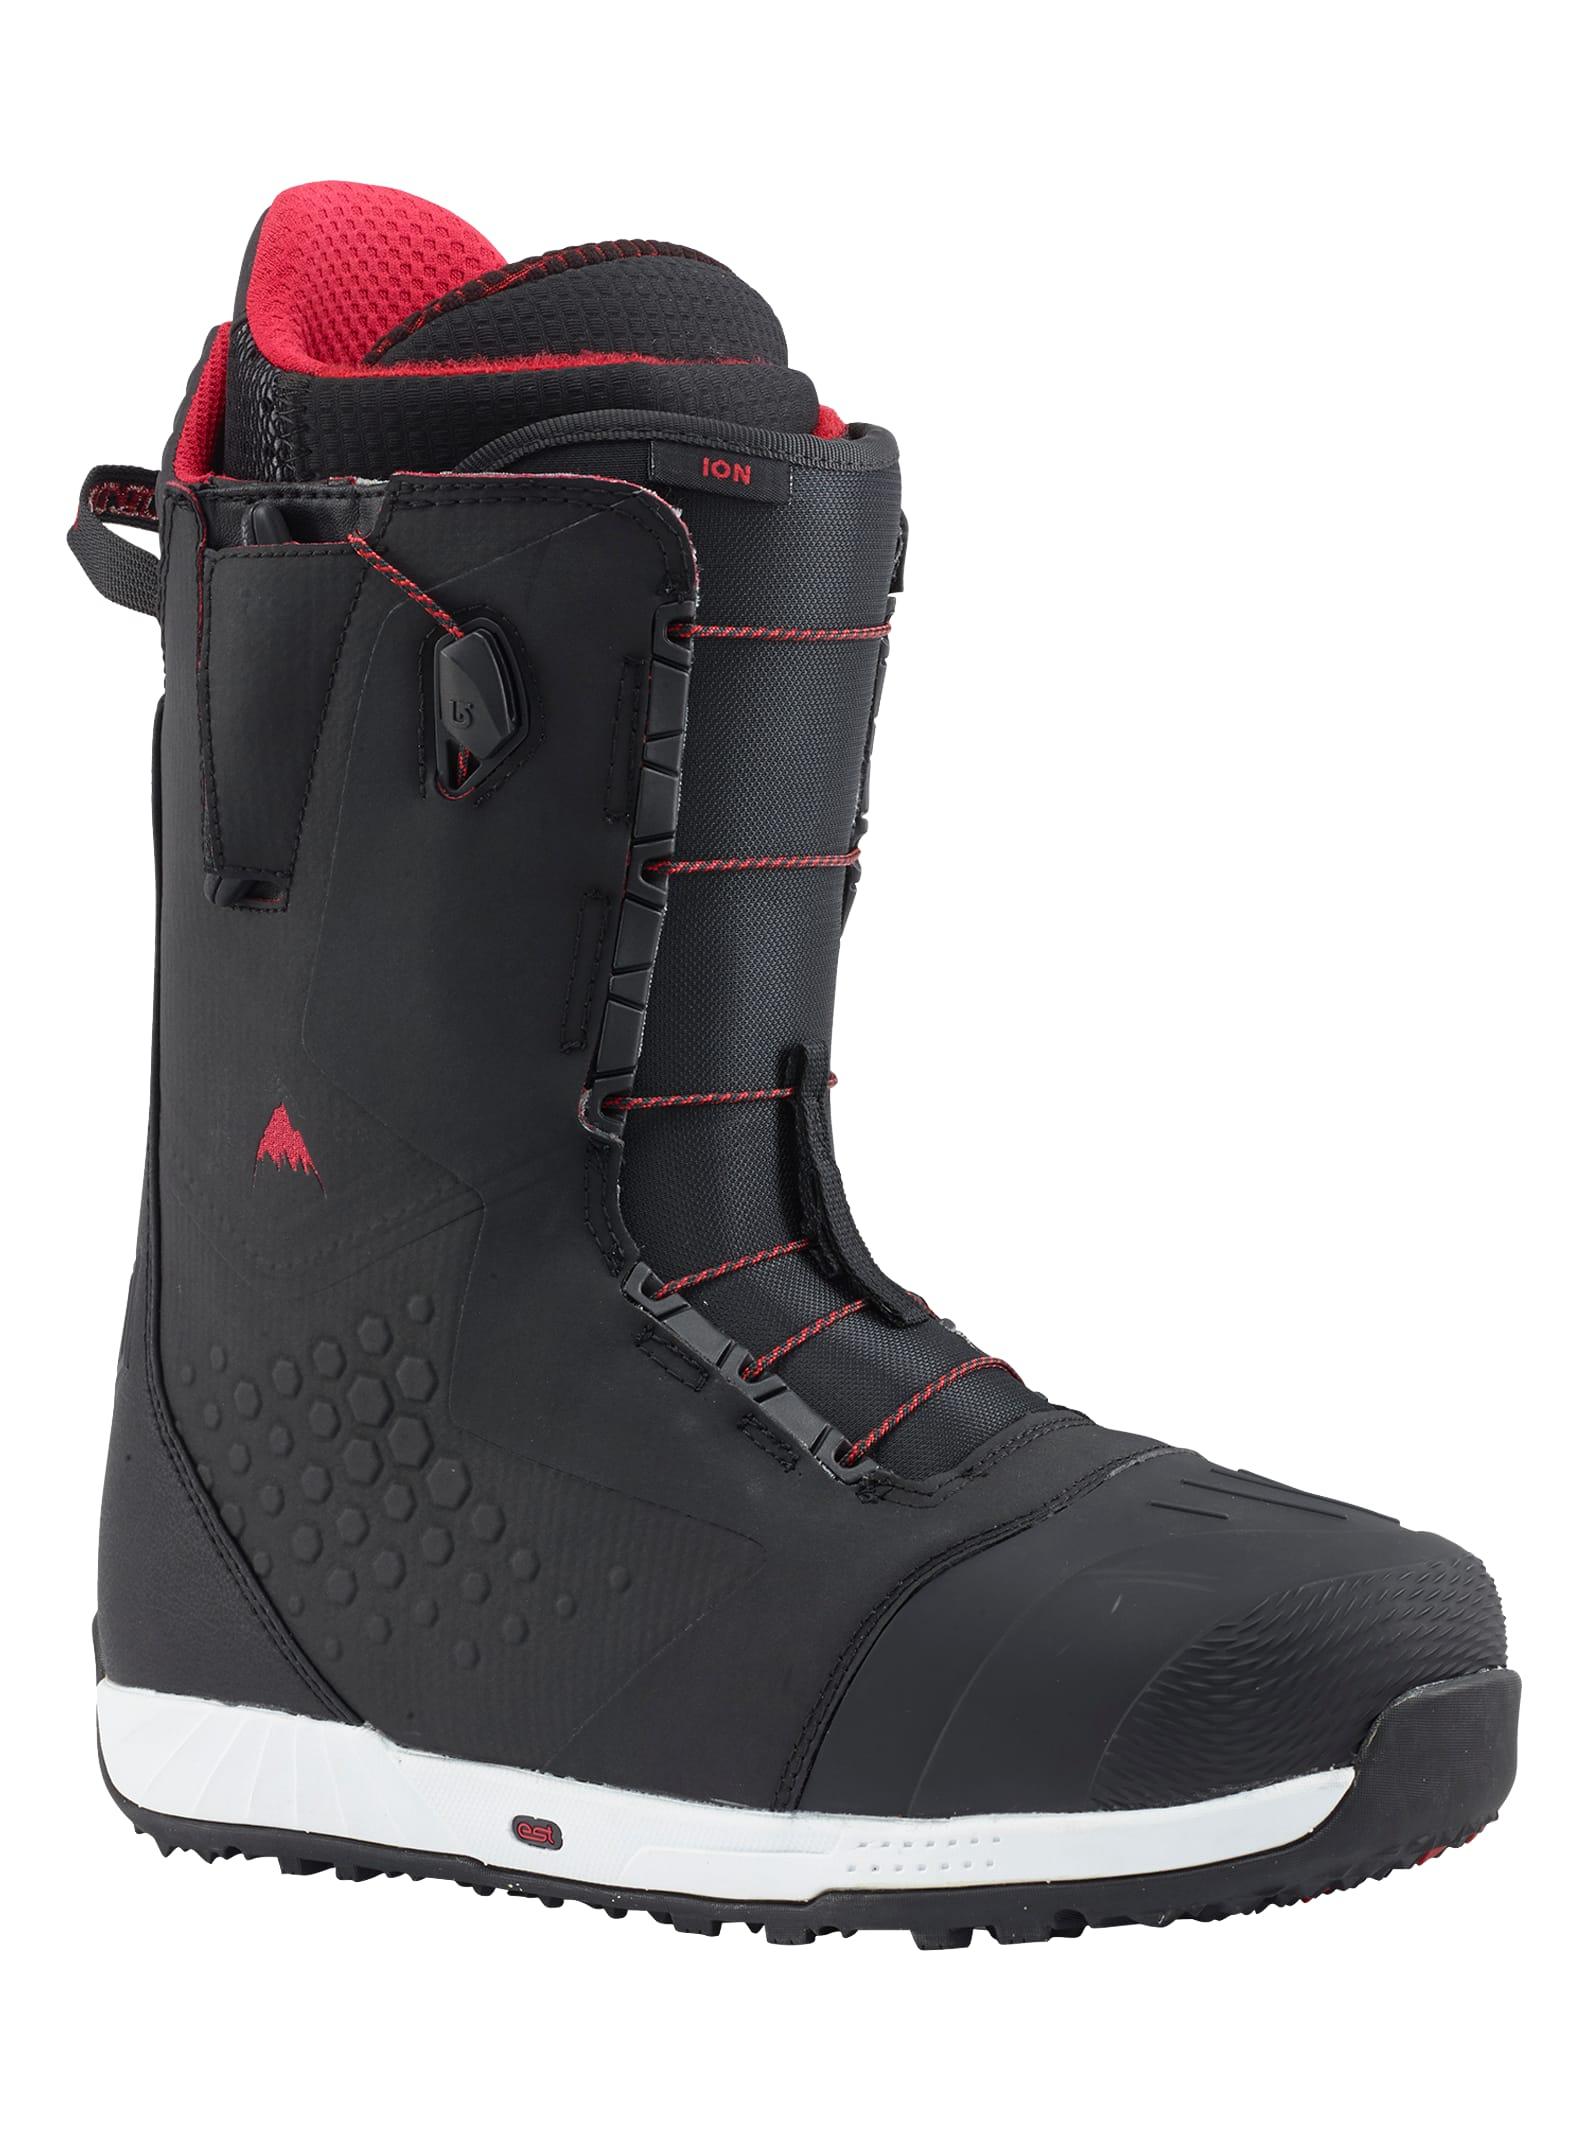 Ion Leather 2018 Red Gr. Cuir Ion 2018 Gr Rouge. 9.5 Us Soft Boots 9.5 Nous Bottes Souples KMarEH3p